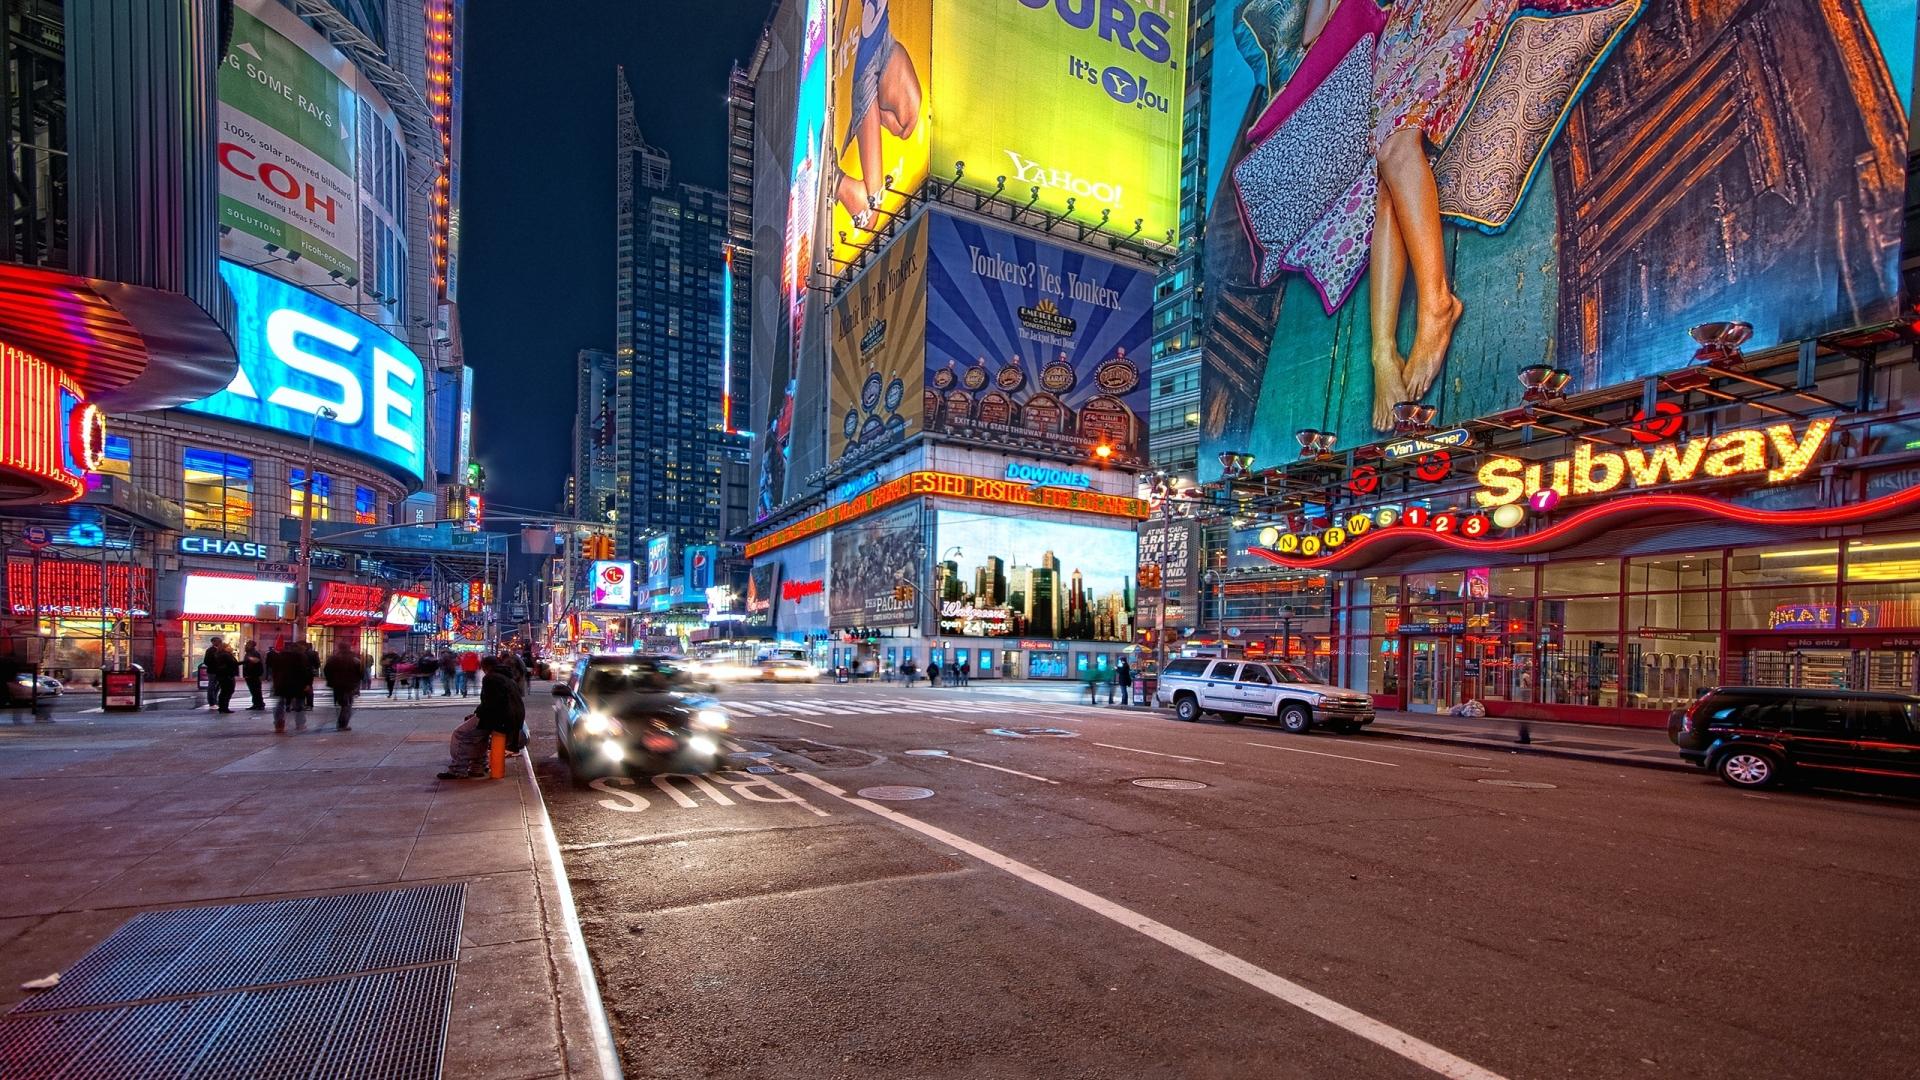 Download New York Night Street 1920x1080 Resolution Full HD 2K